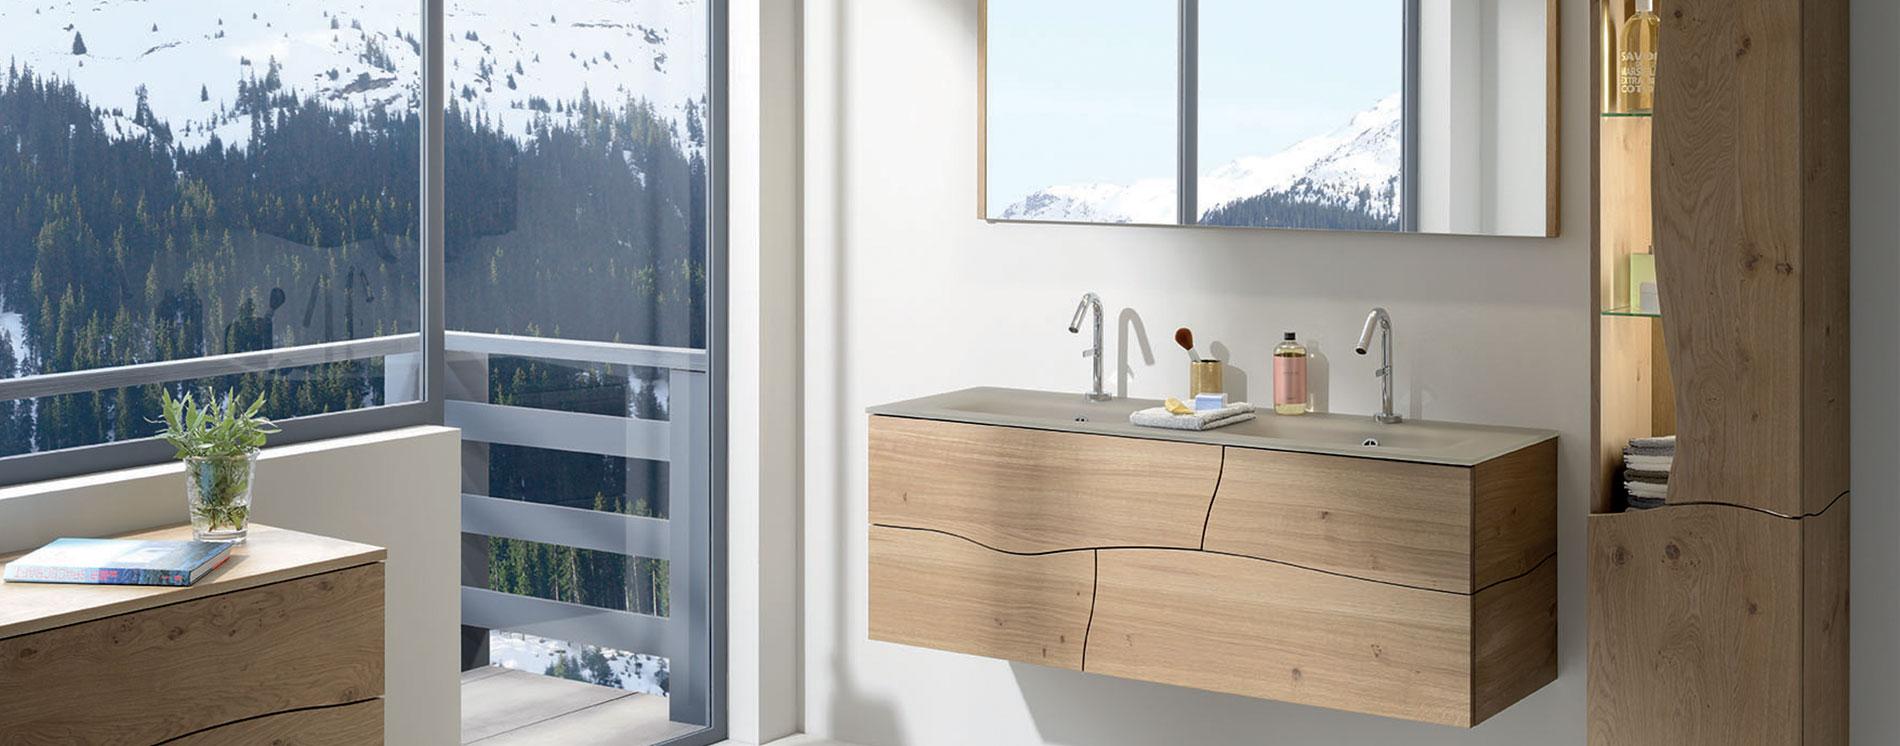 alle unsere sortimente f r das badezimmer sanijura. Black Bedroom Furniture Sets. Home Design Ideas